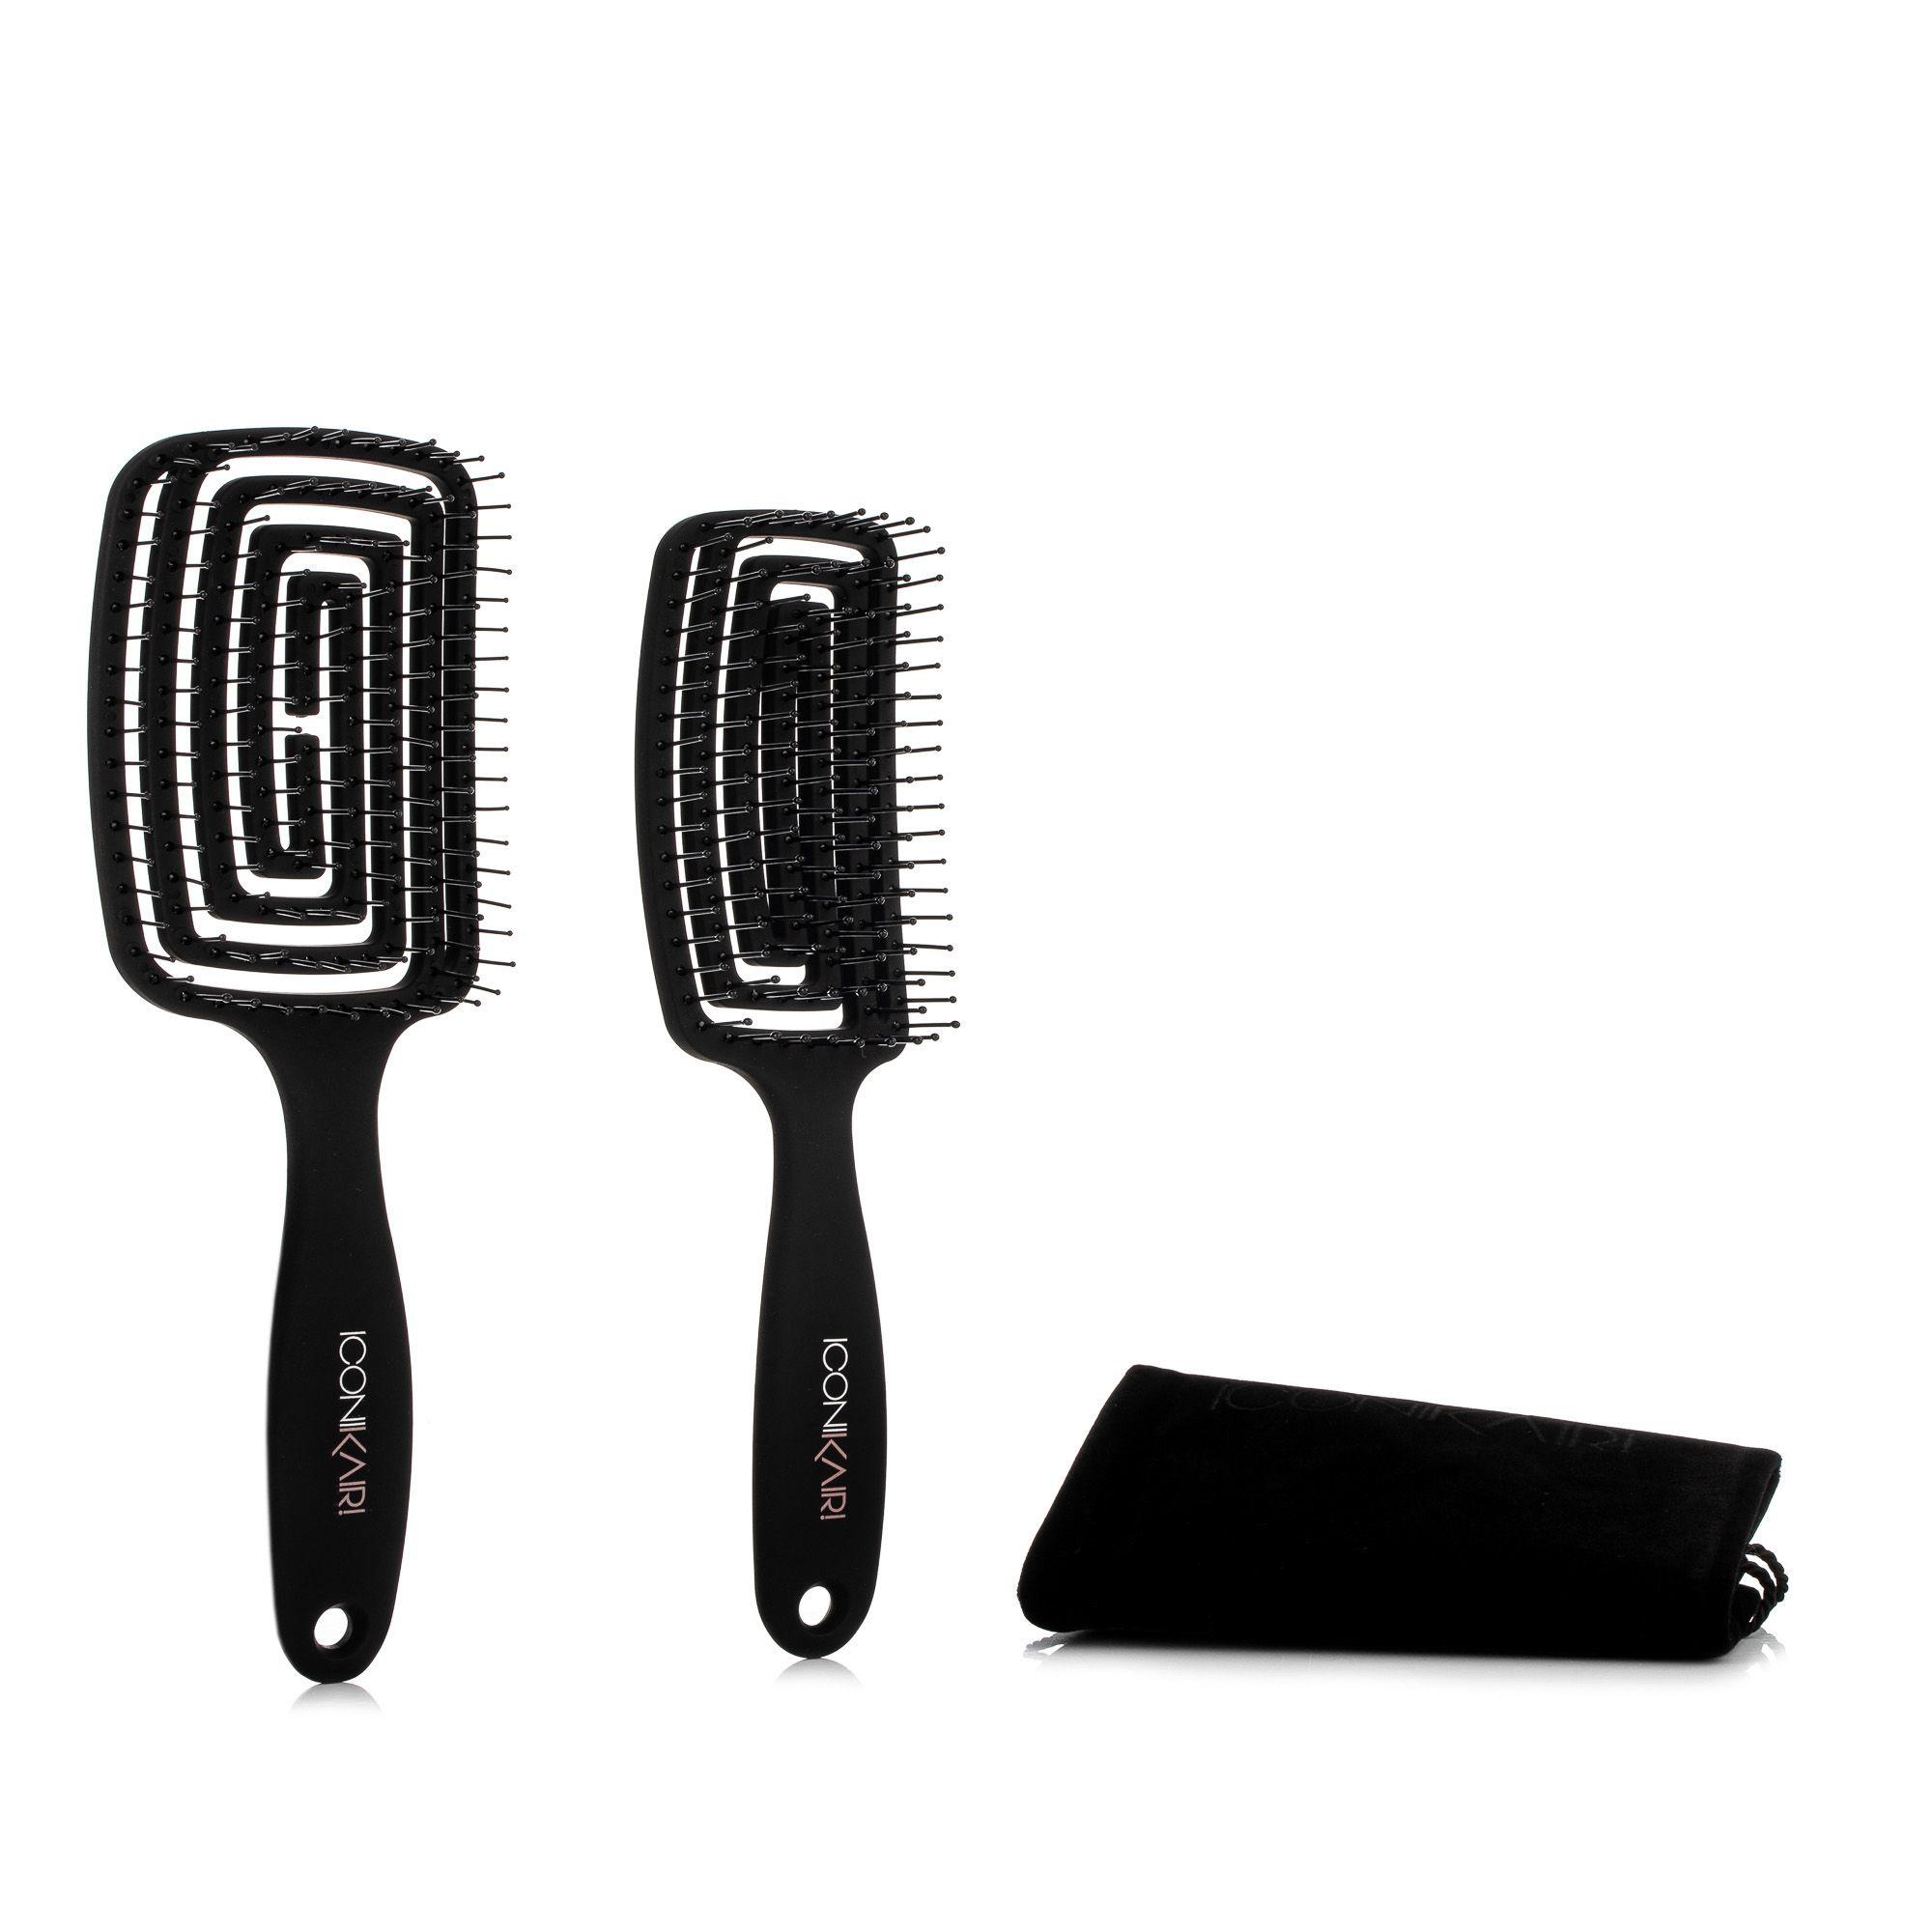 ICONIKAIR Duo Classic-Set 2 Haarbürsten für volleres Haar inkl. Travel-Samtbeutel